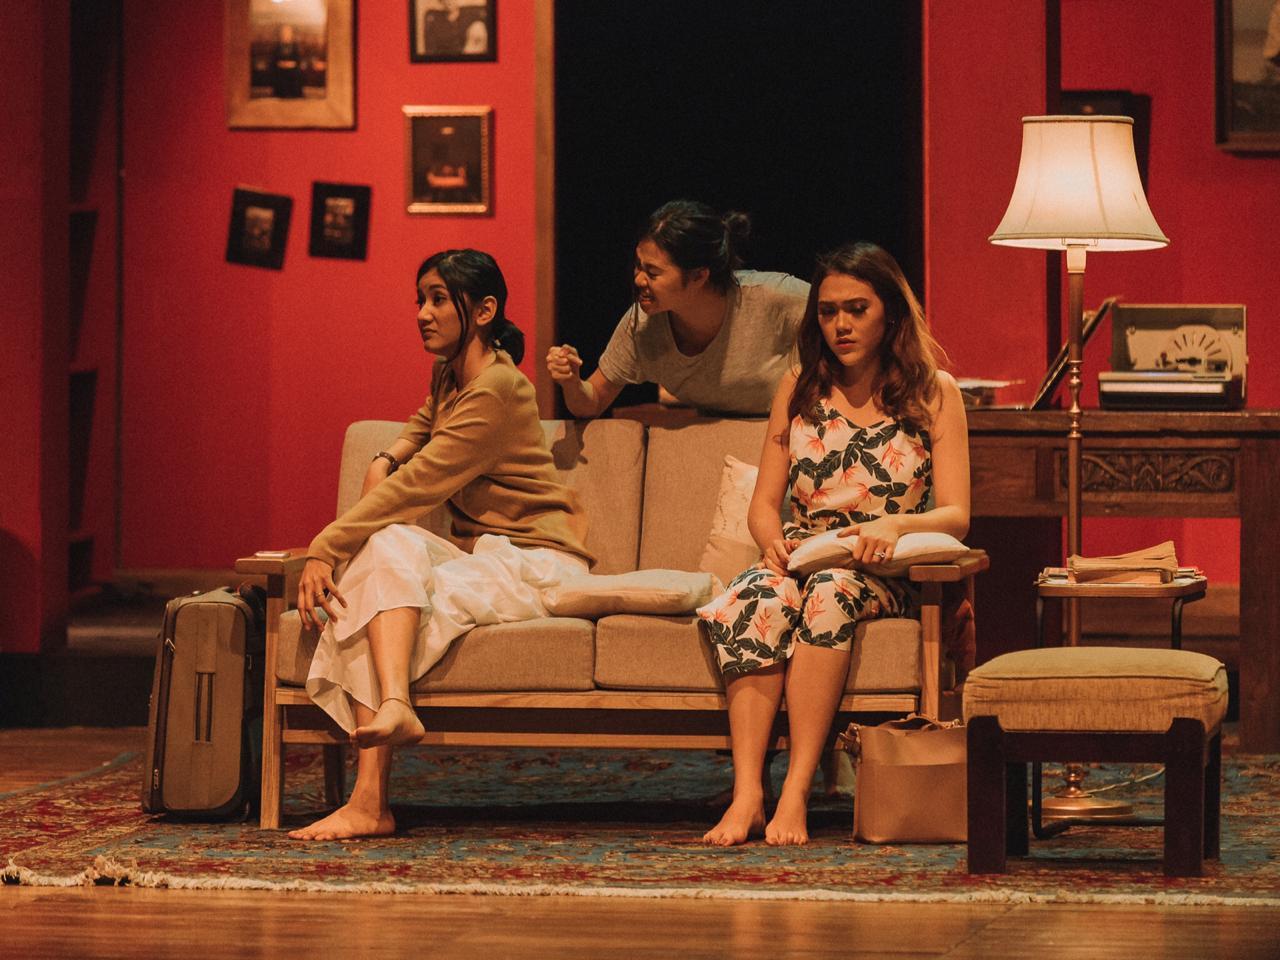 Sumber: Teater Pandora —  Potret putri-putri Martha dan Martin; Kiri: Diana (Nabila Putri Utami), Tengah: Lisa (Margareta Marisa), Kanan: Mia (Cindy Nirmala)